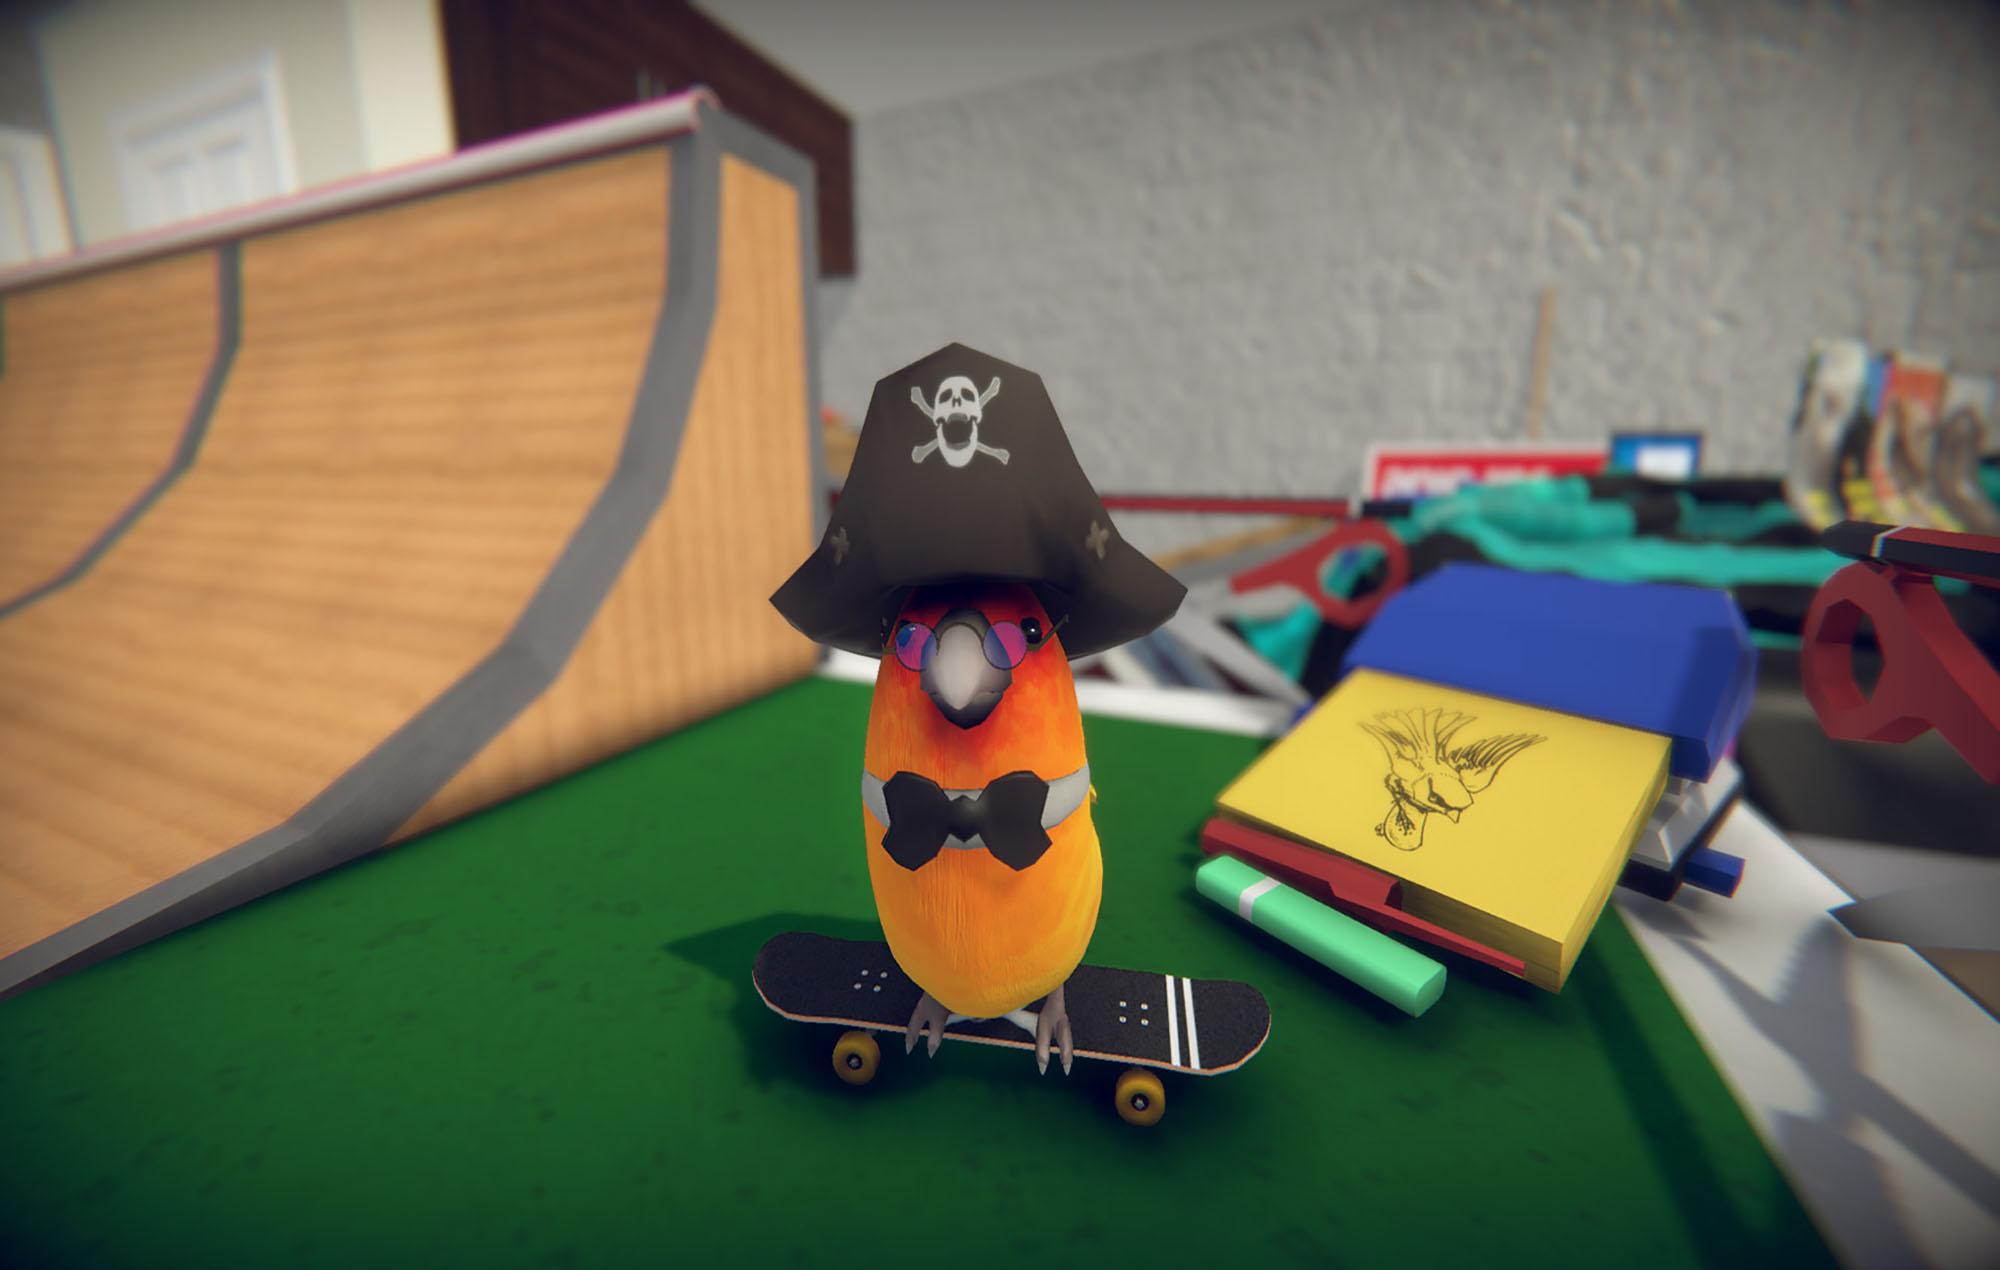 'Skatebird' brings the modern world to a genre steeped in nostalgia